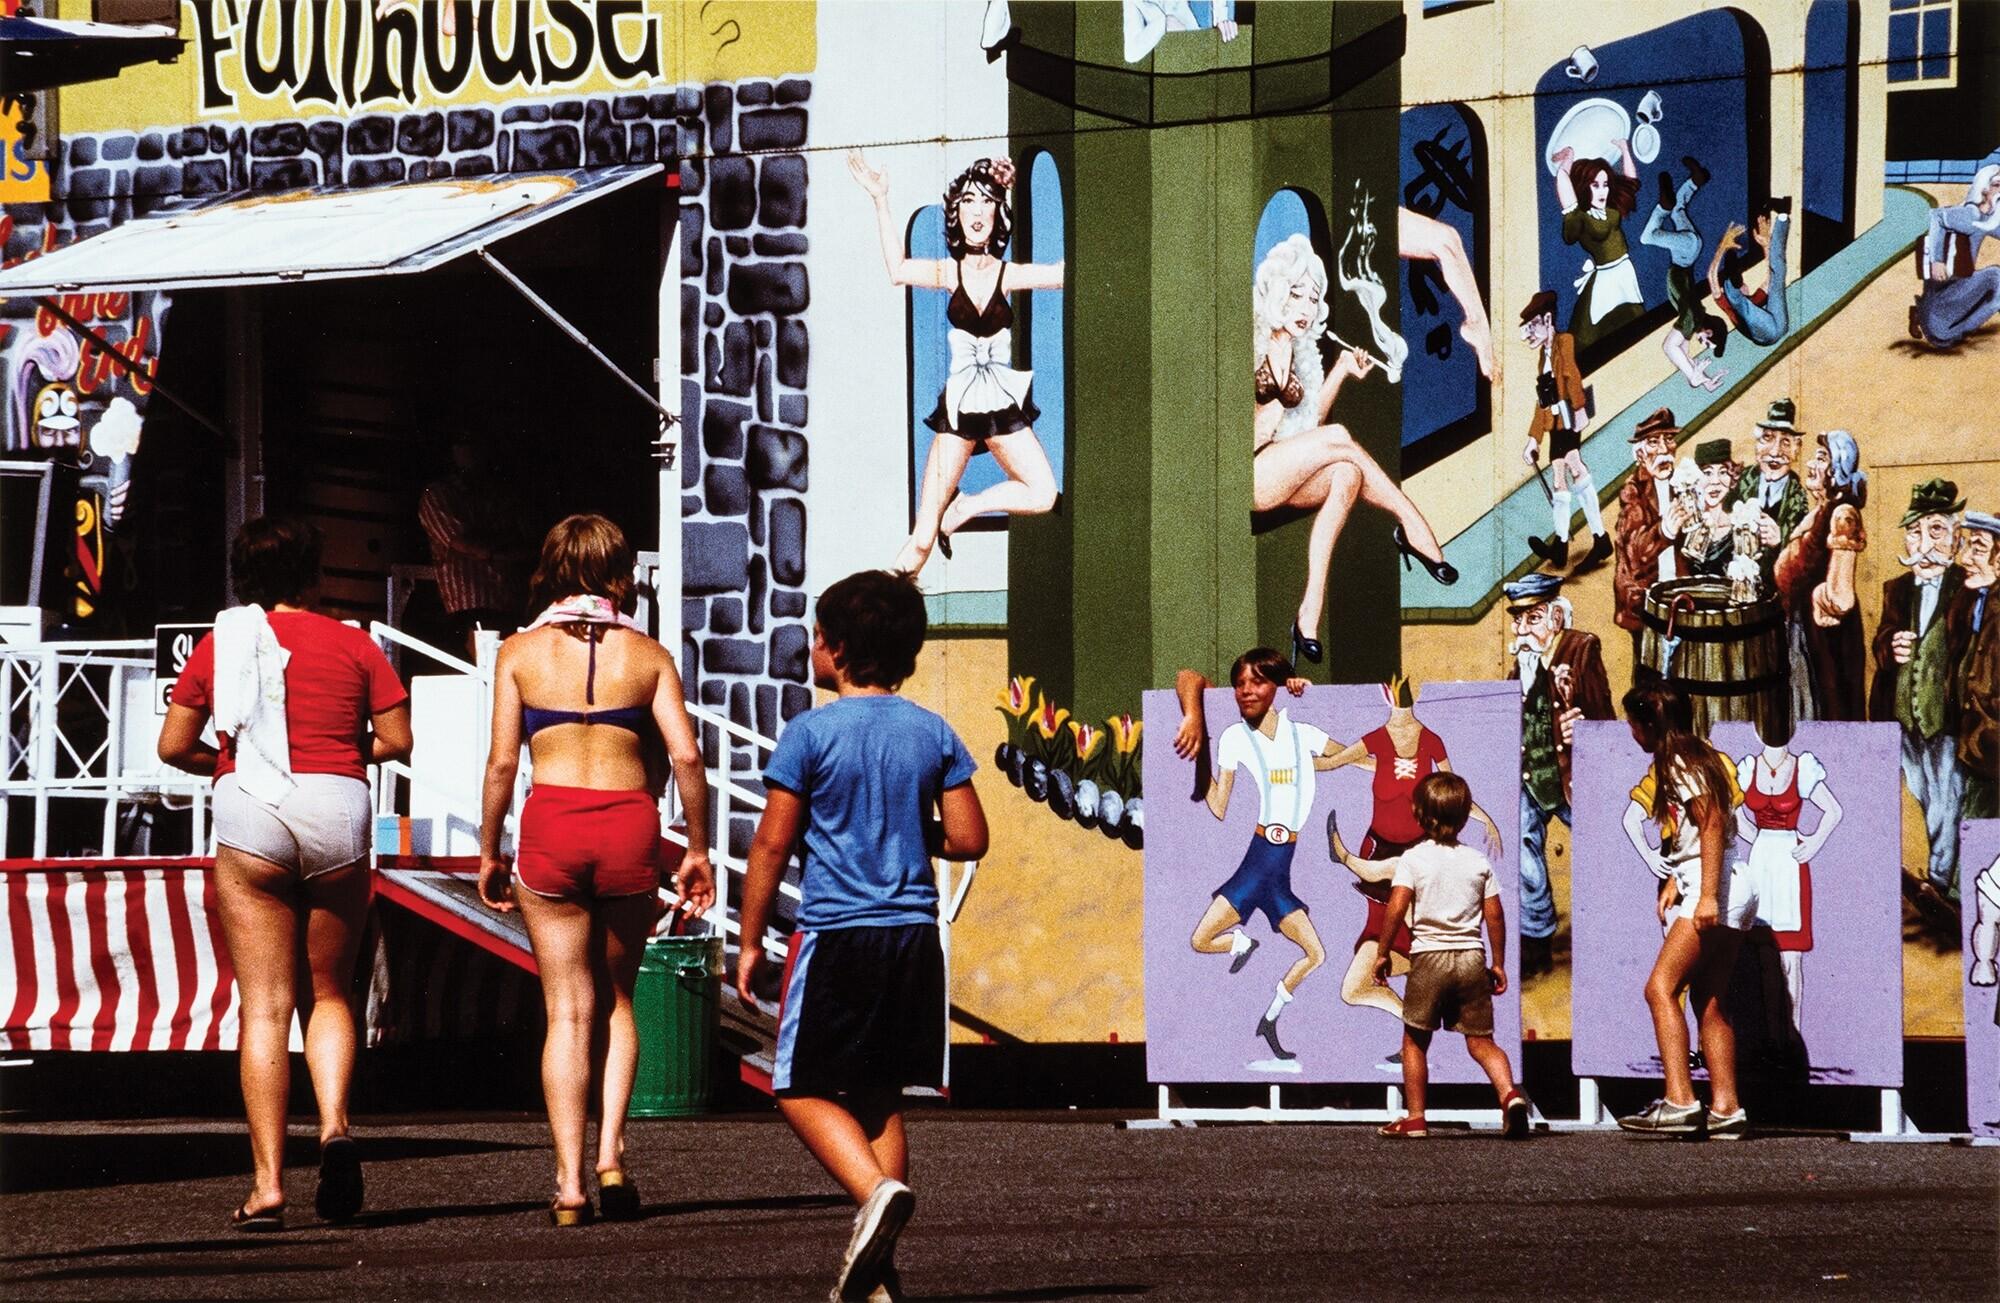 Люди в городе, 1982. Фотограф Франко Фонтана